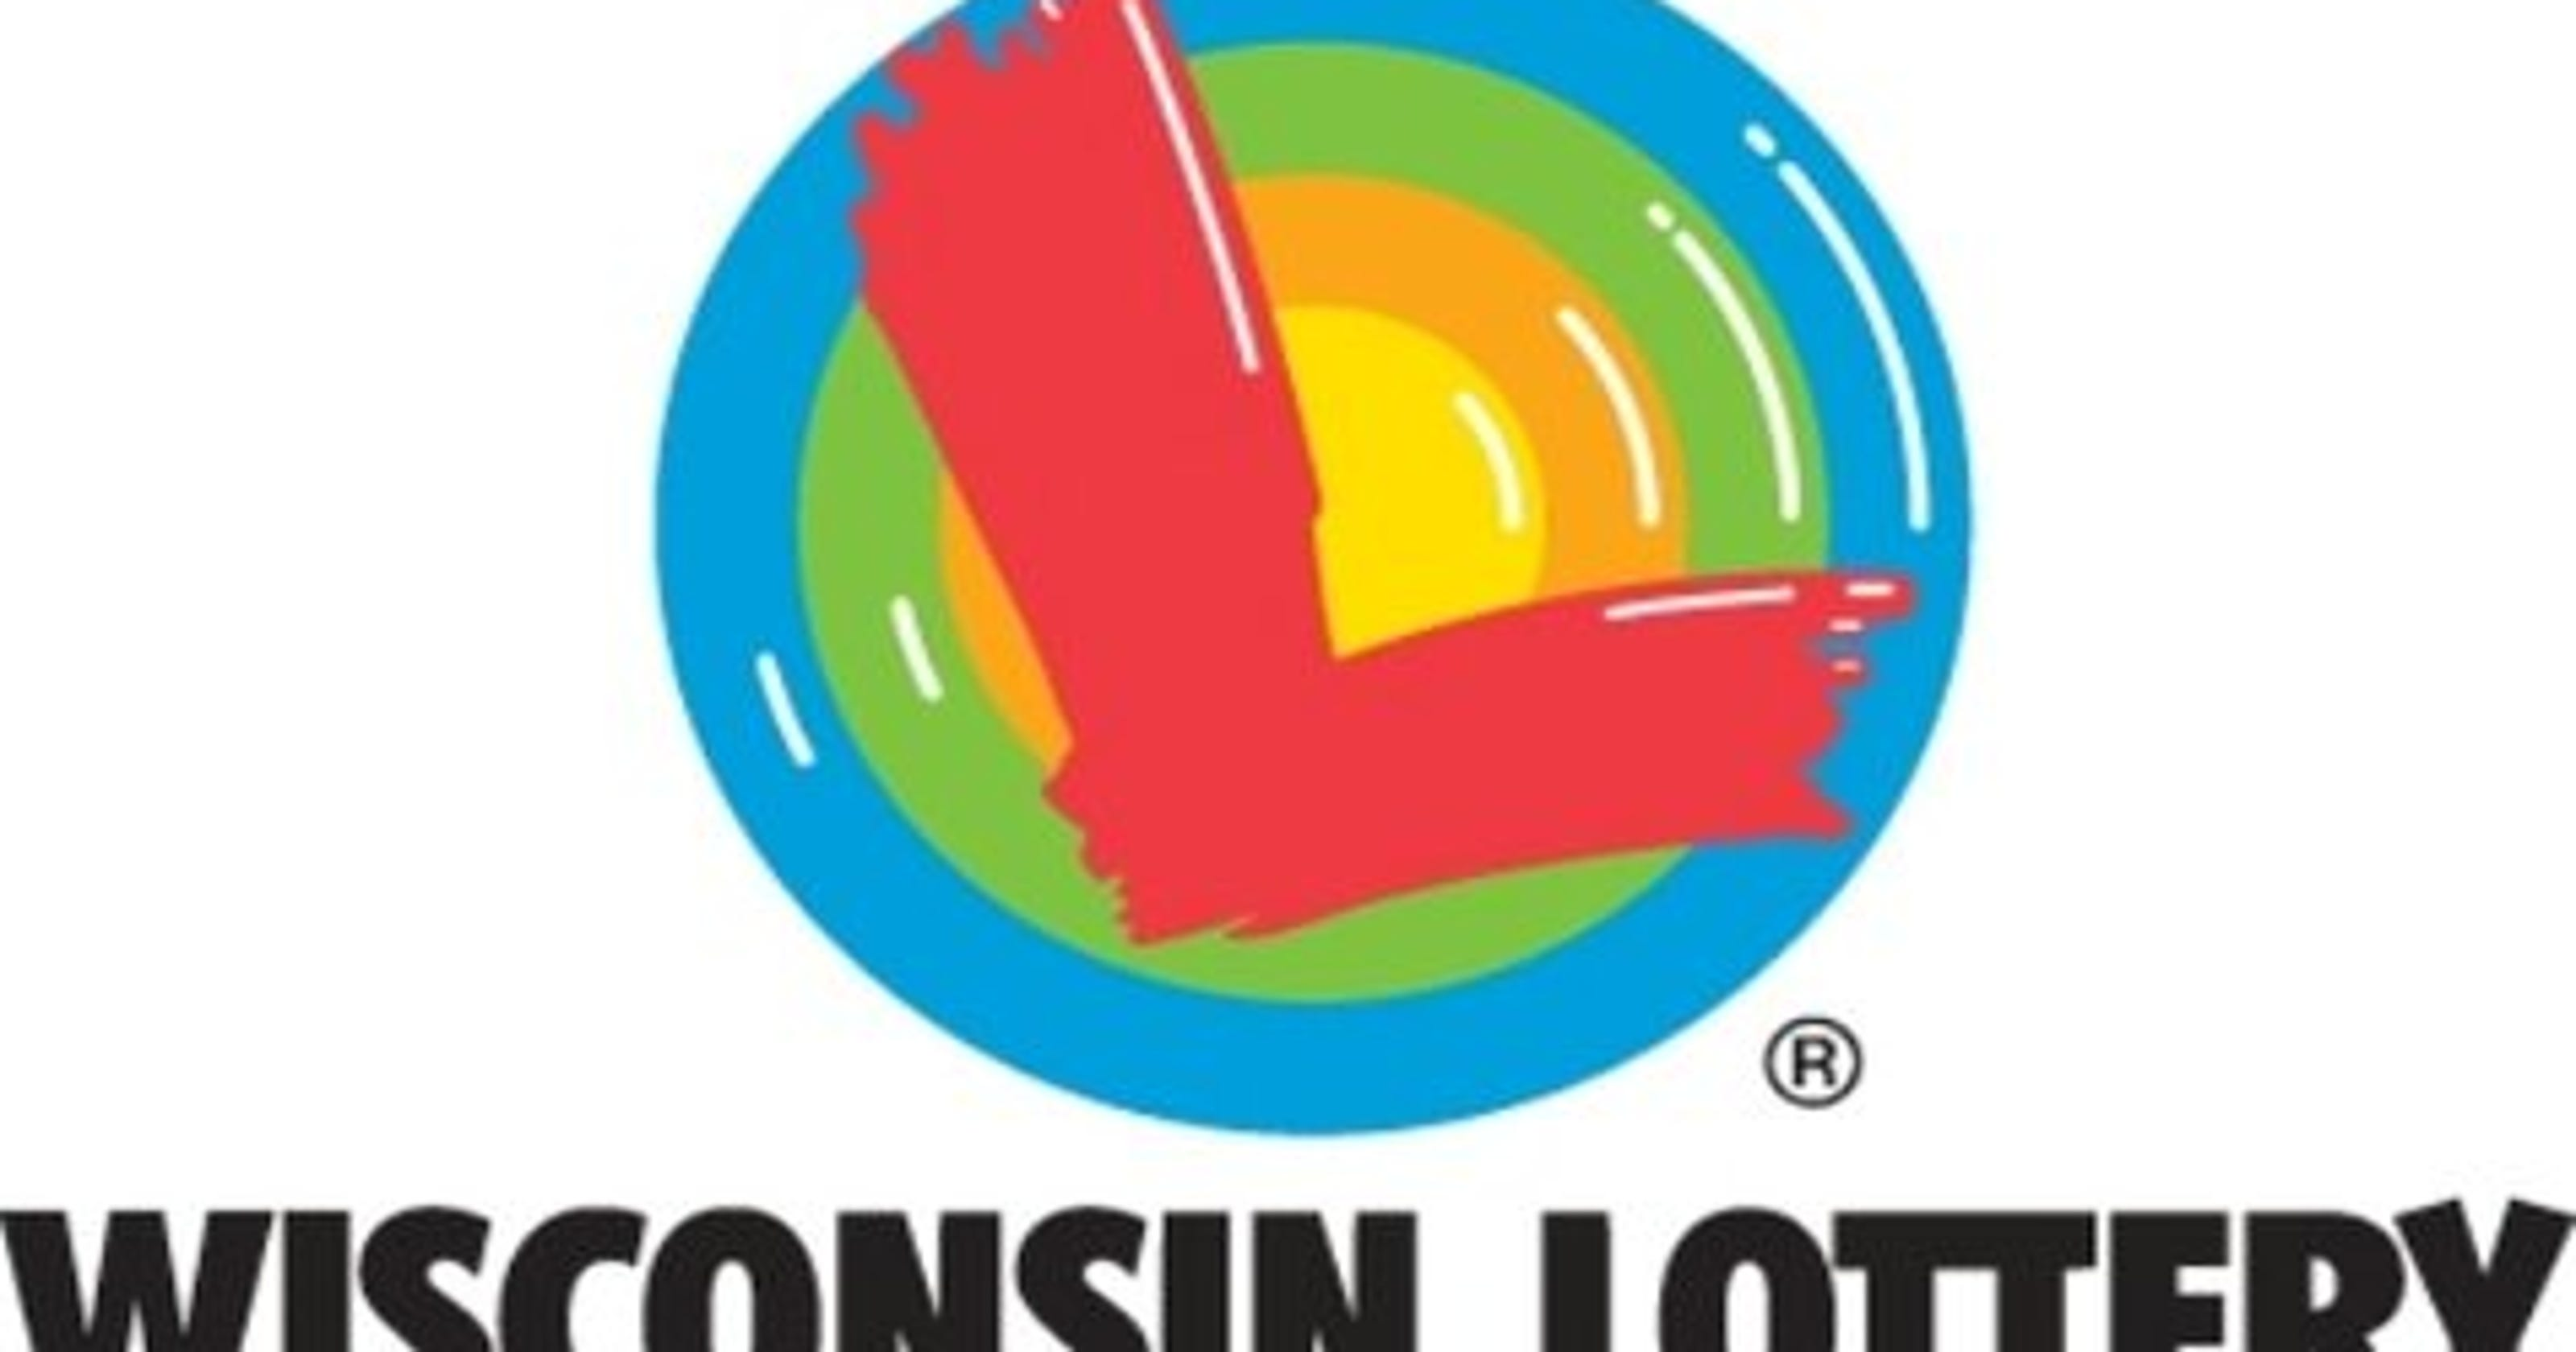 Wisconsin Lottery Sheboyganite Claims 1 Million Megabucks Prize